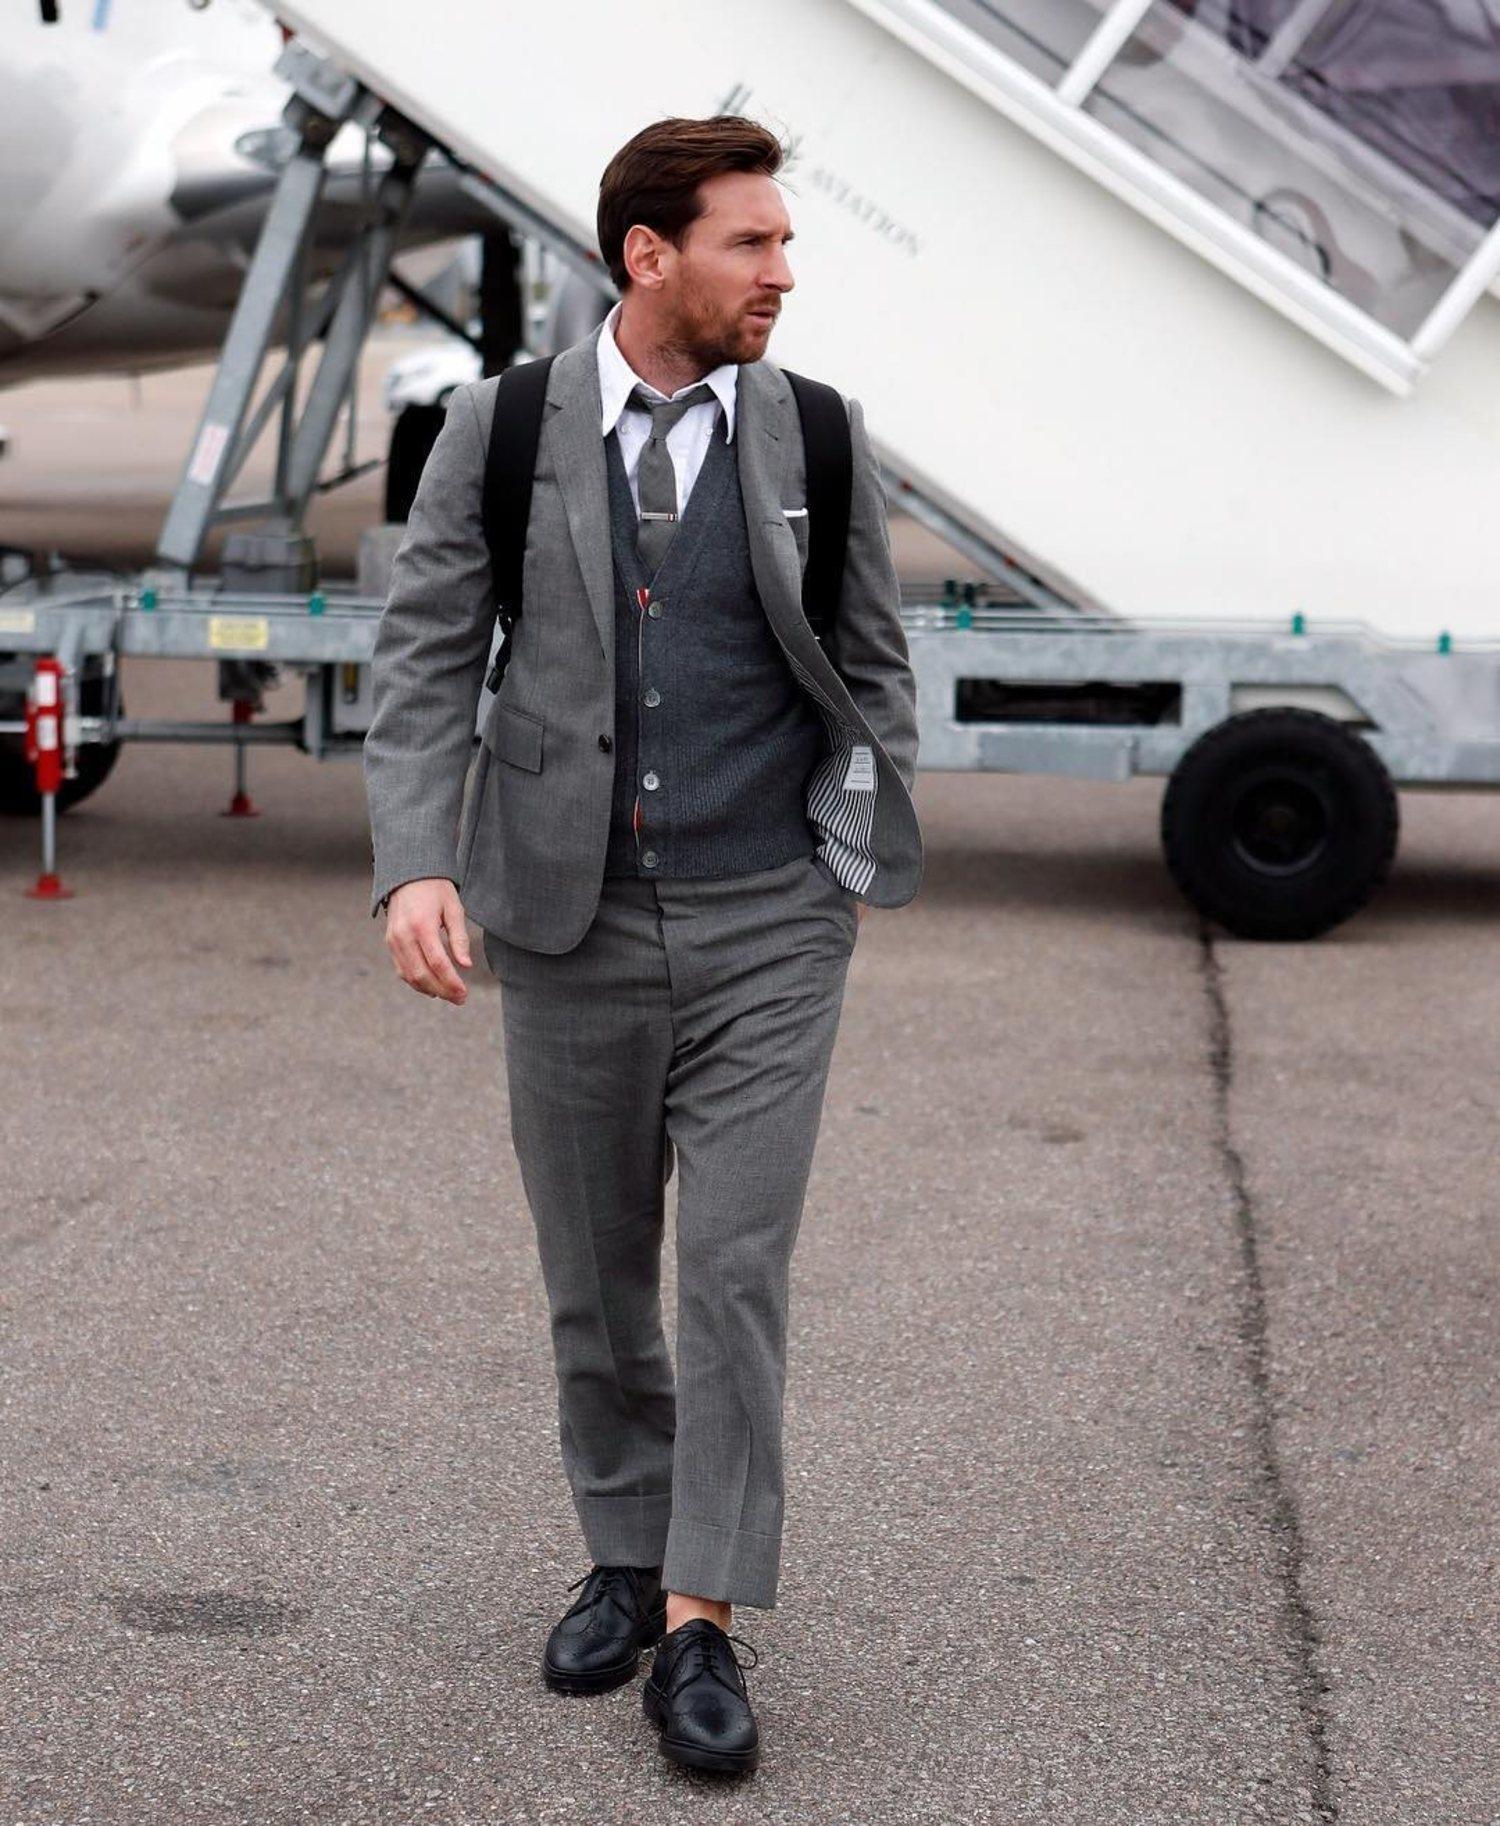 Lionel Messi, bienvenido a Shelby Company Limited.